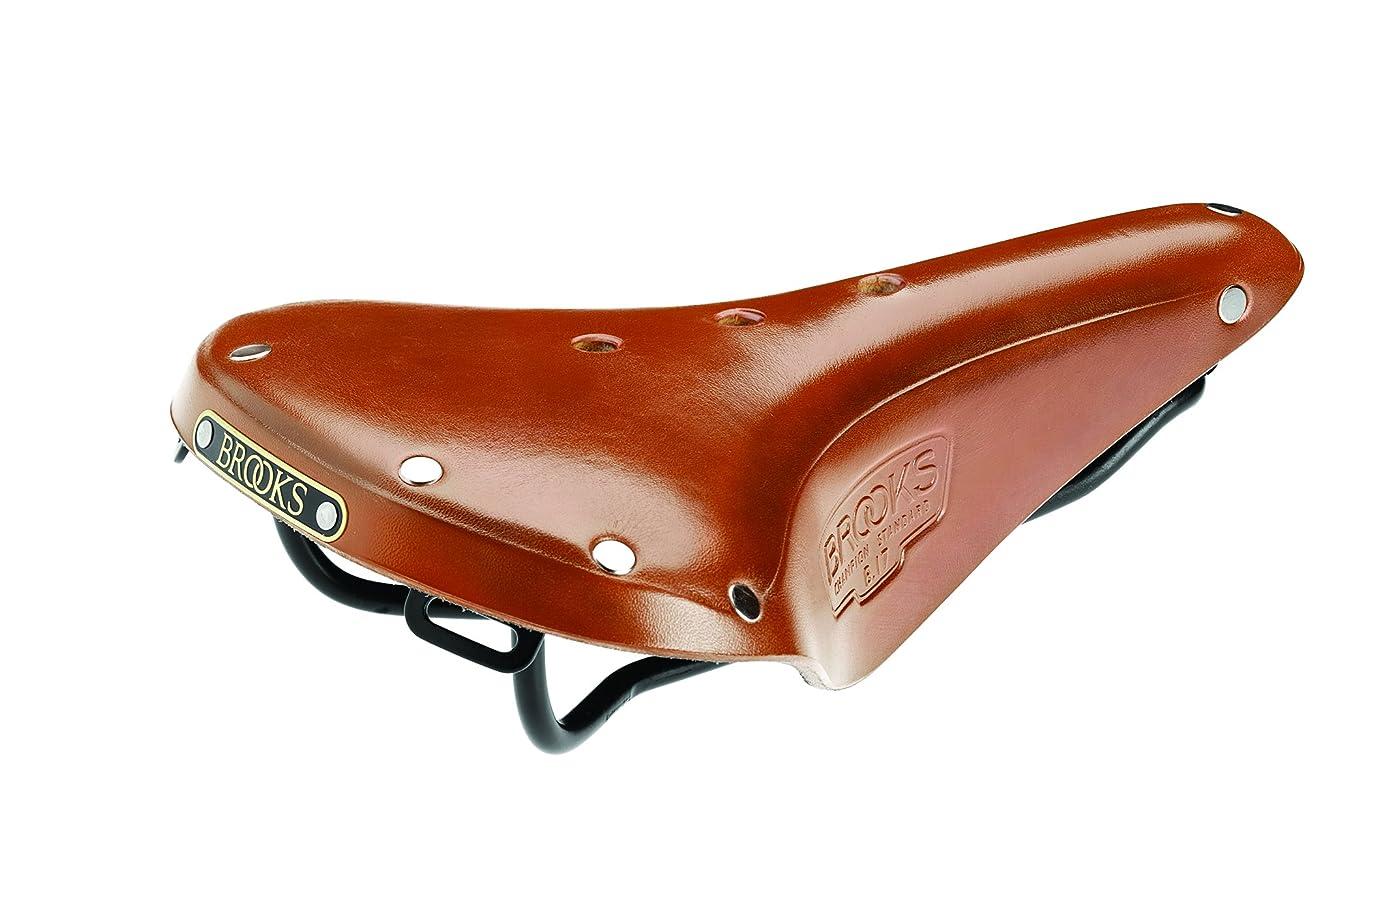 Brooks England B17 Bike Saddle - Handmade Leather Bike Seat (Steel, Titanium, Copper)